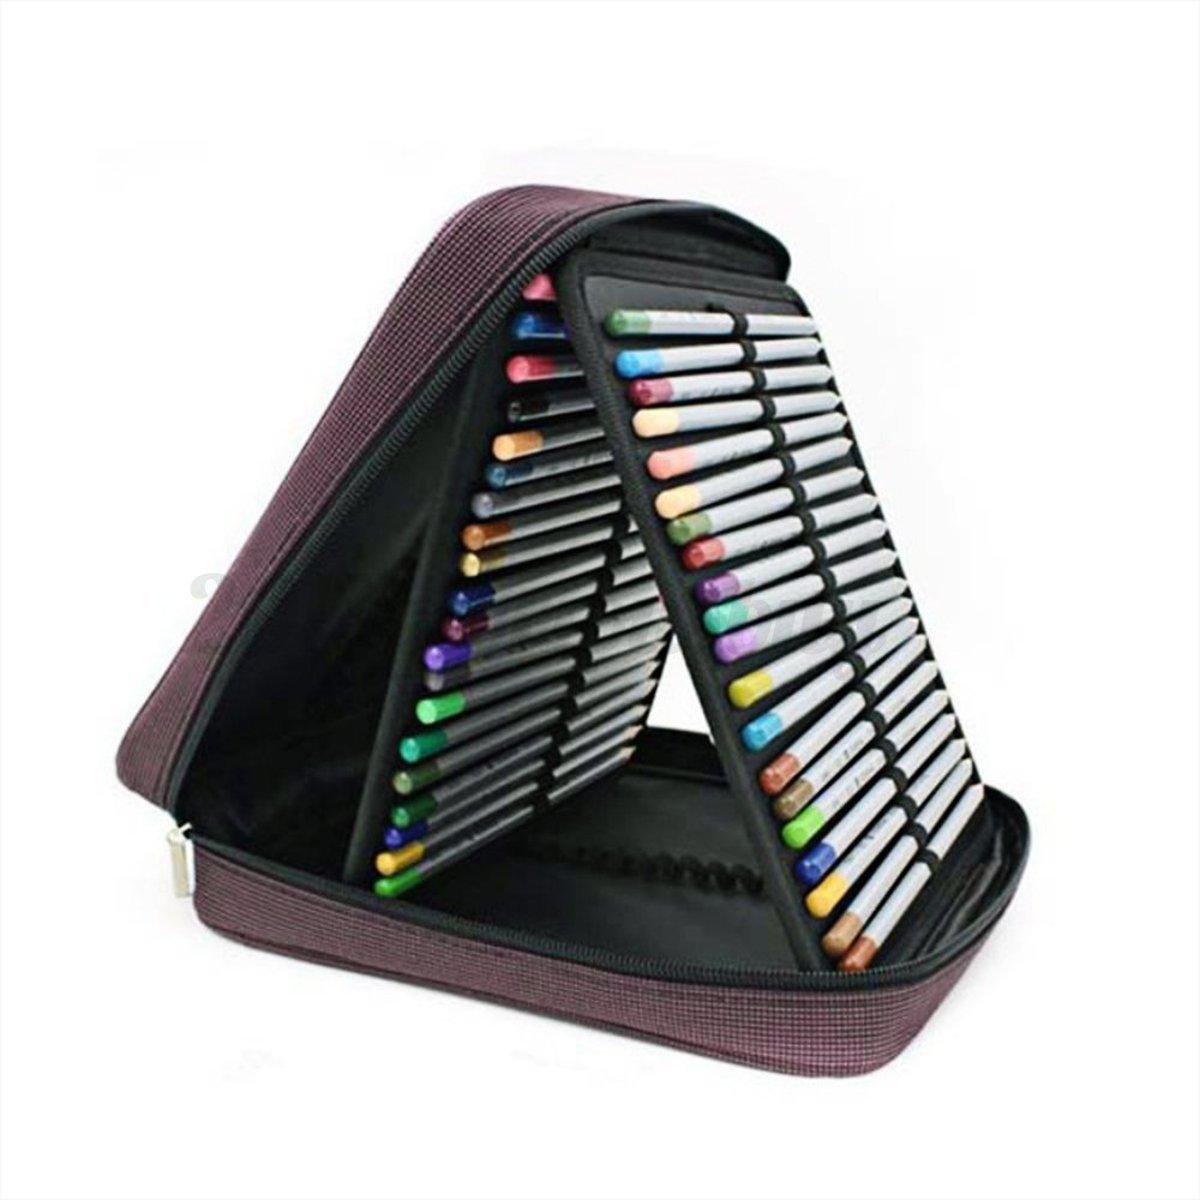 120 Slots Colored Pencil Case Multilayer Foldable Storage Ba